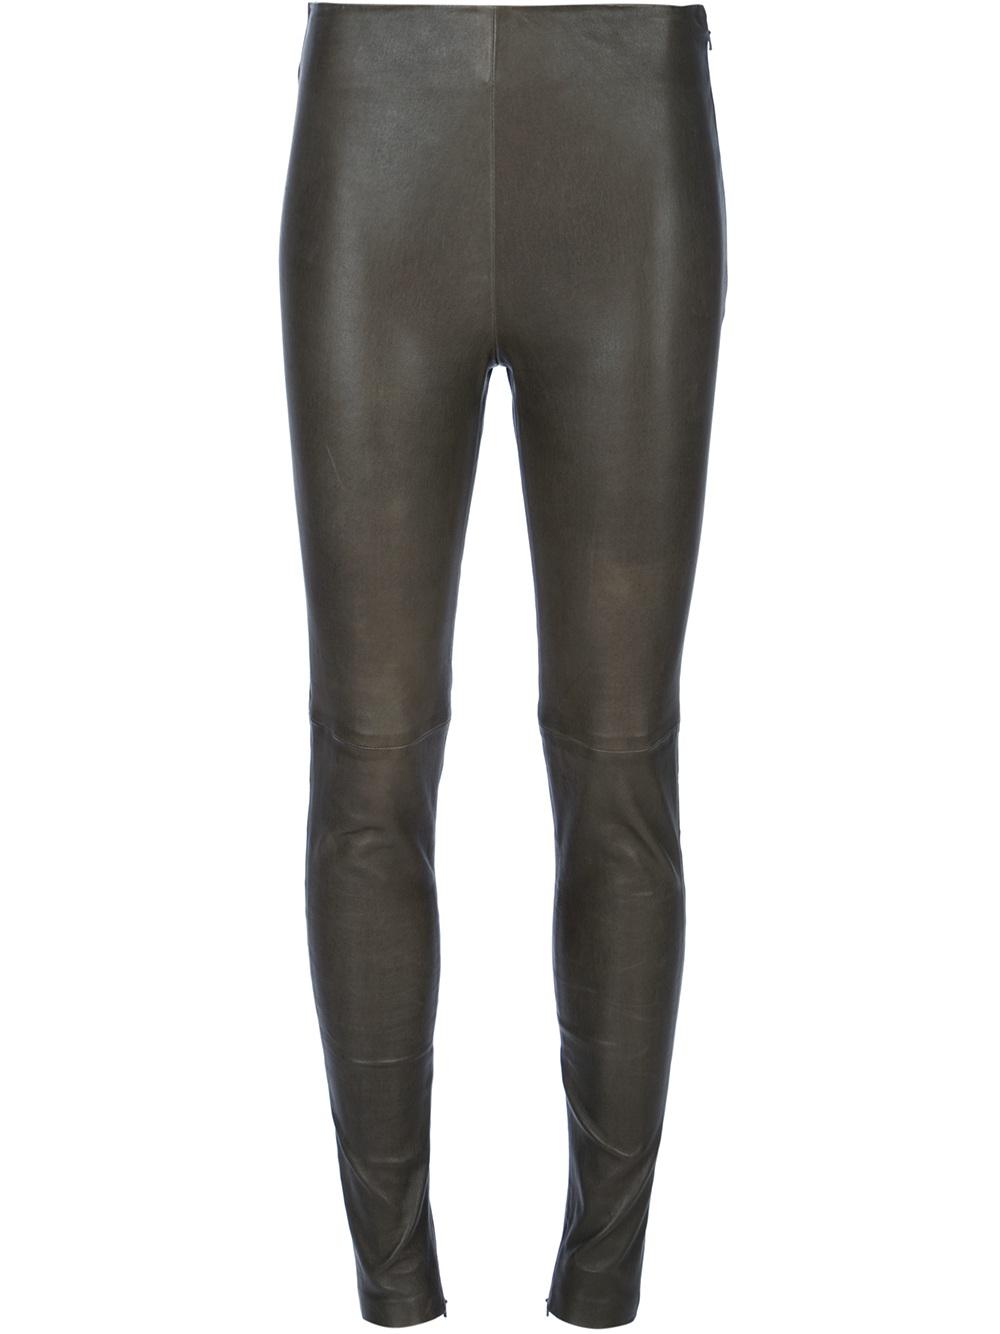 4953e5e97a6581 Gallery. Previously sold at: Farfetch · Women's Leather Leggings